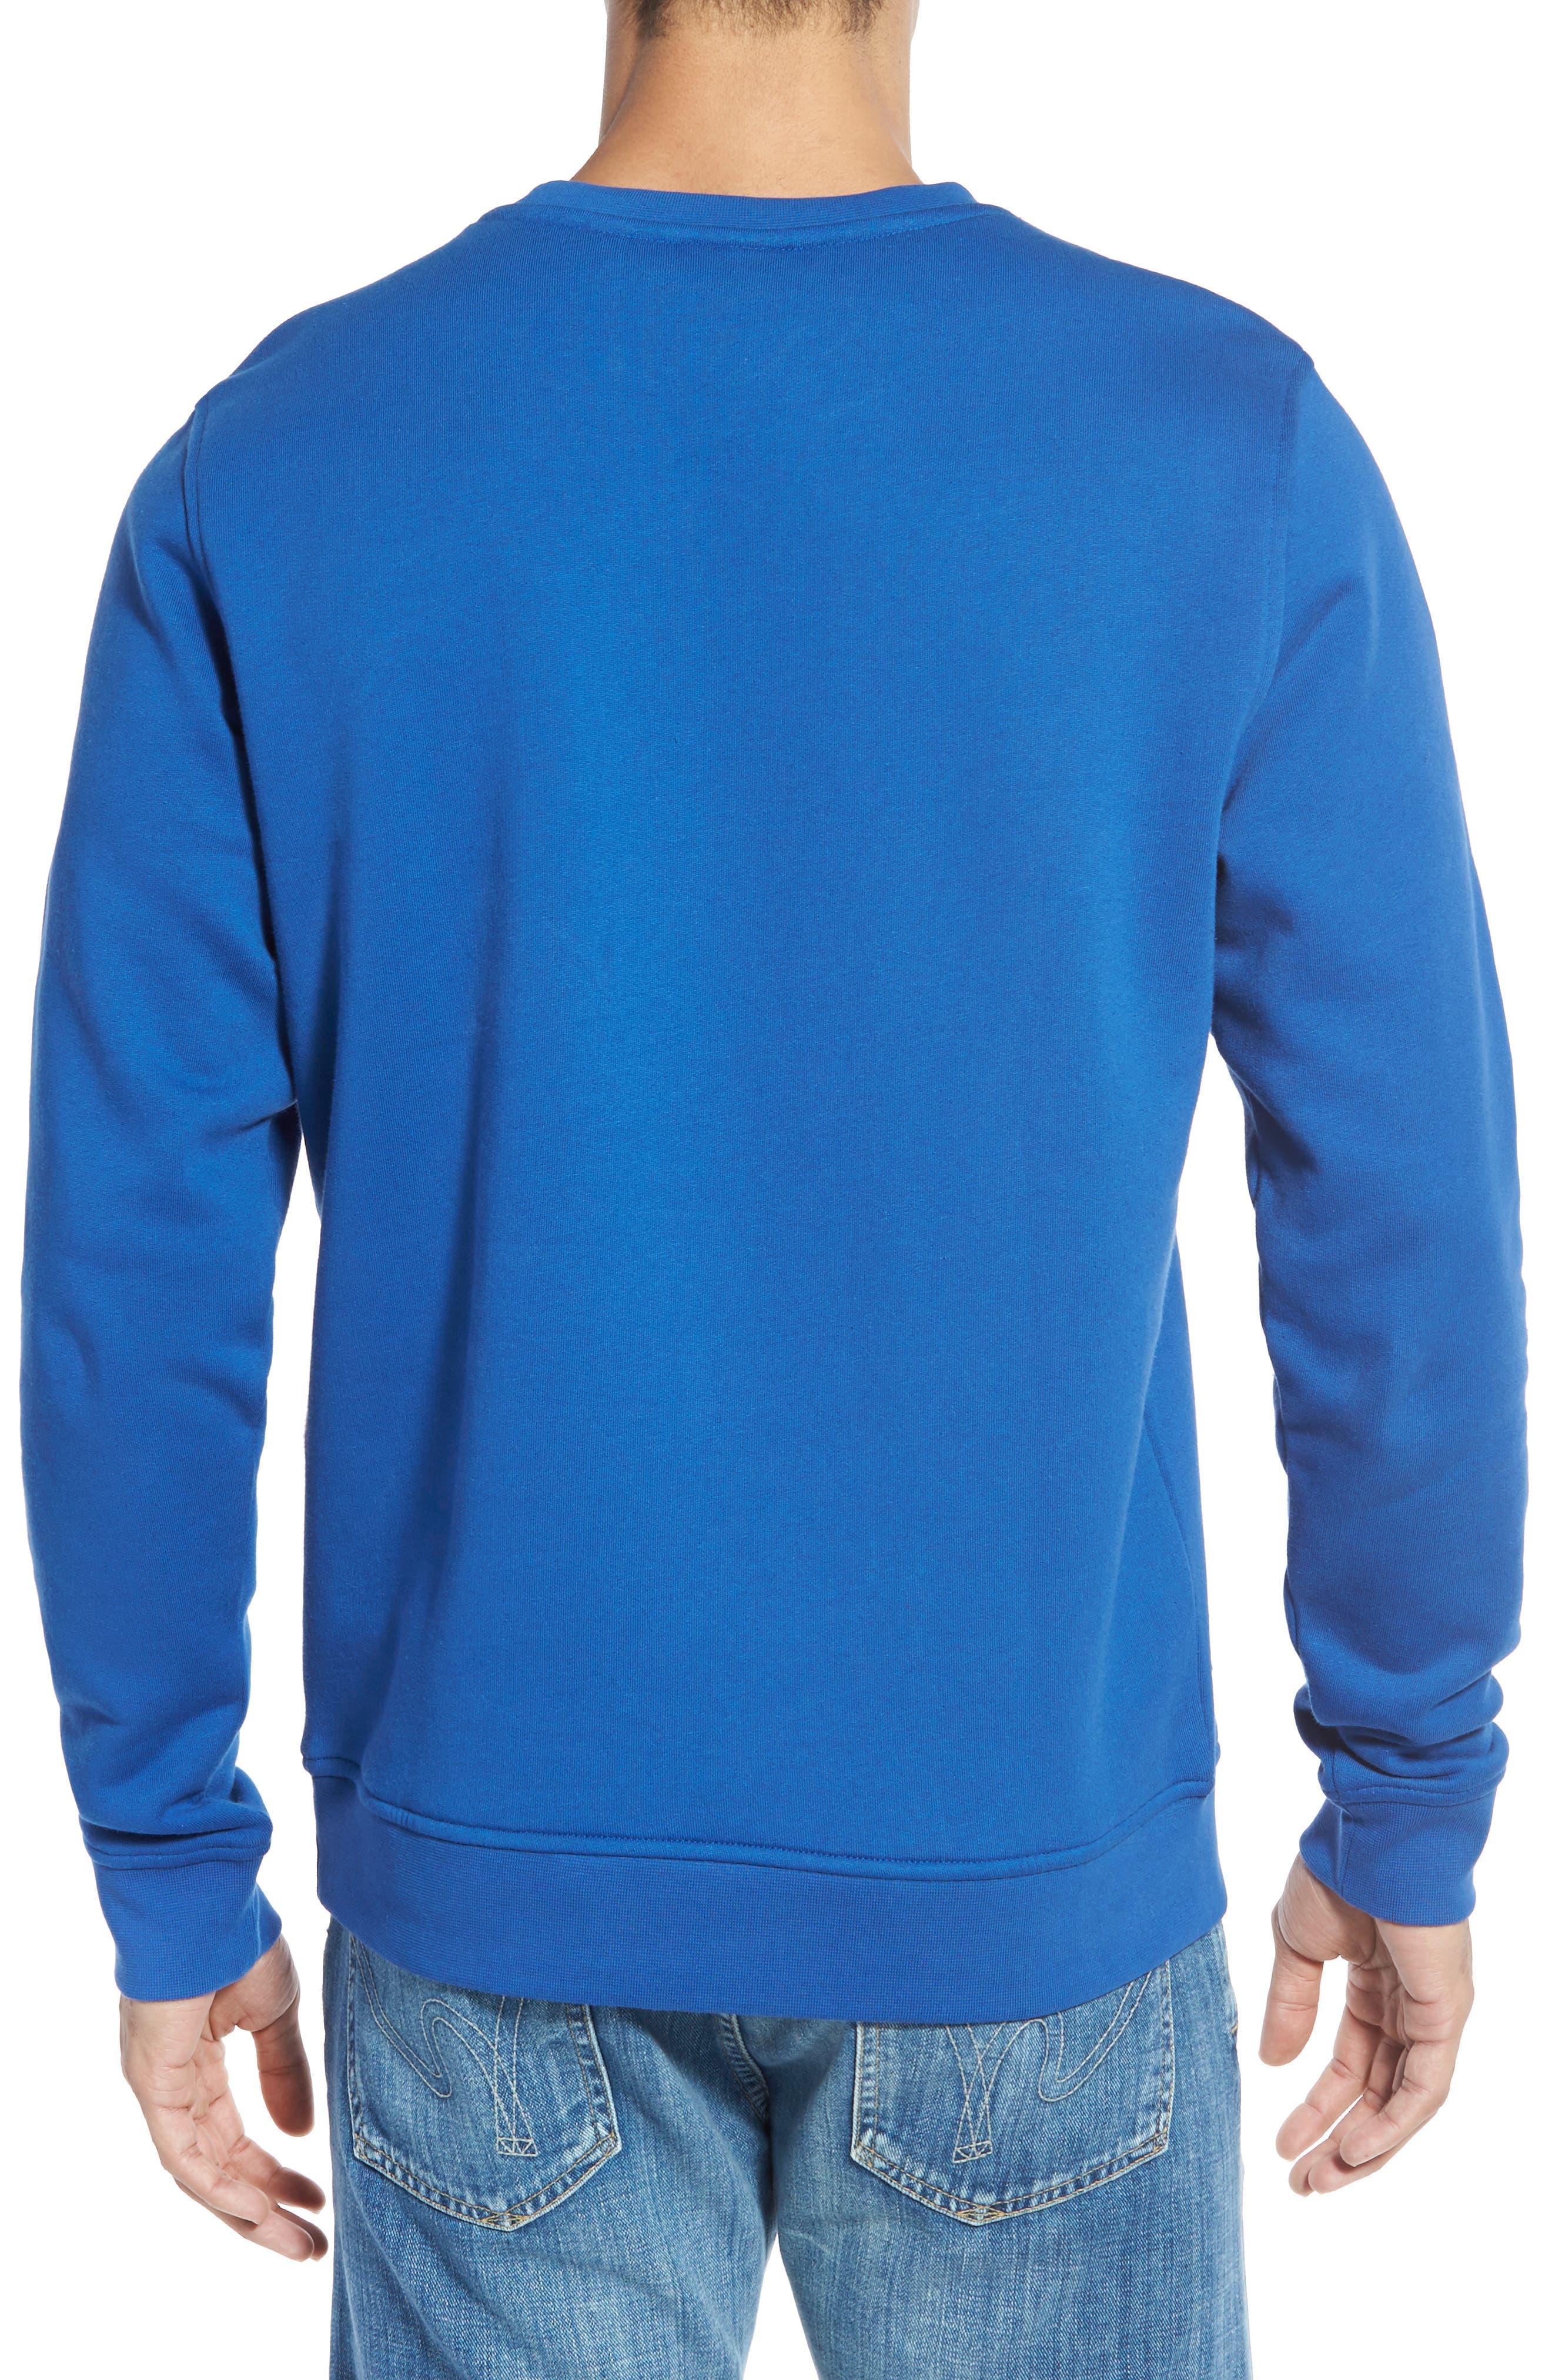 'Sport' Crewneck Sweatshirt,                             Alternate thumbnail 2, color,                             NAVY